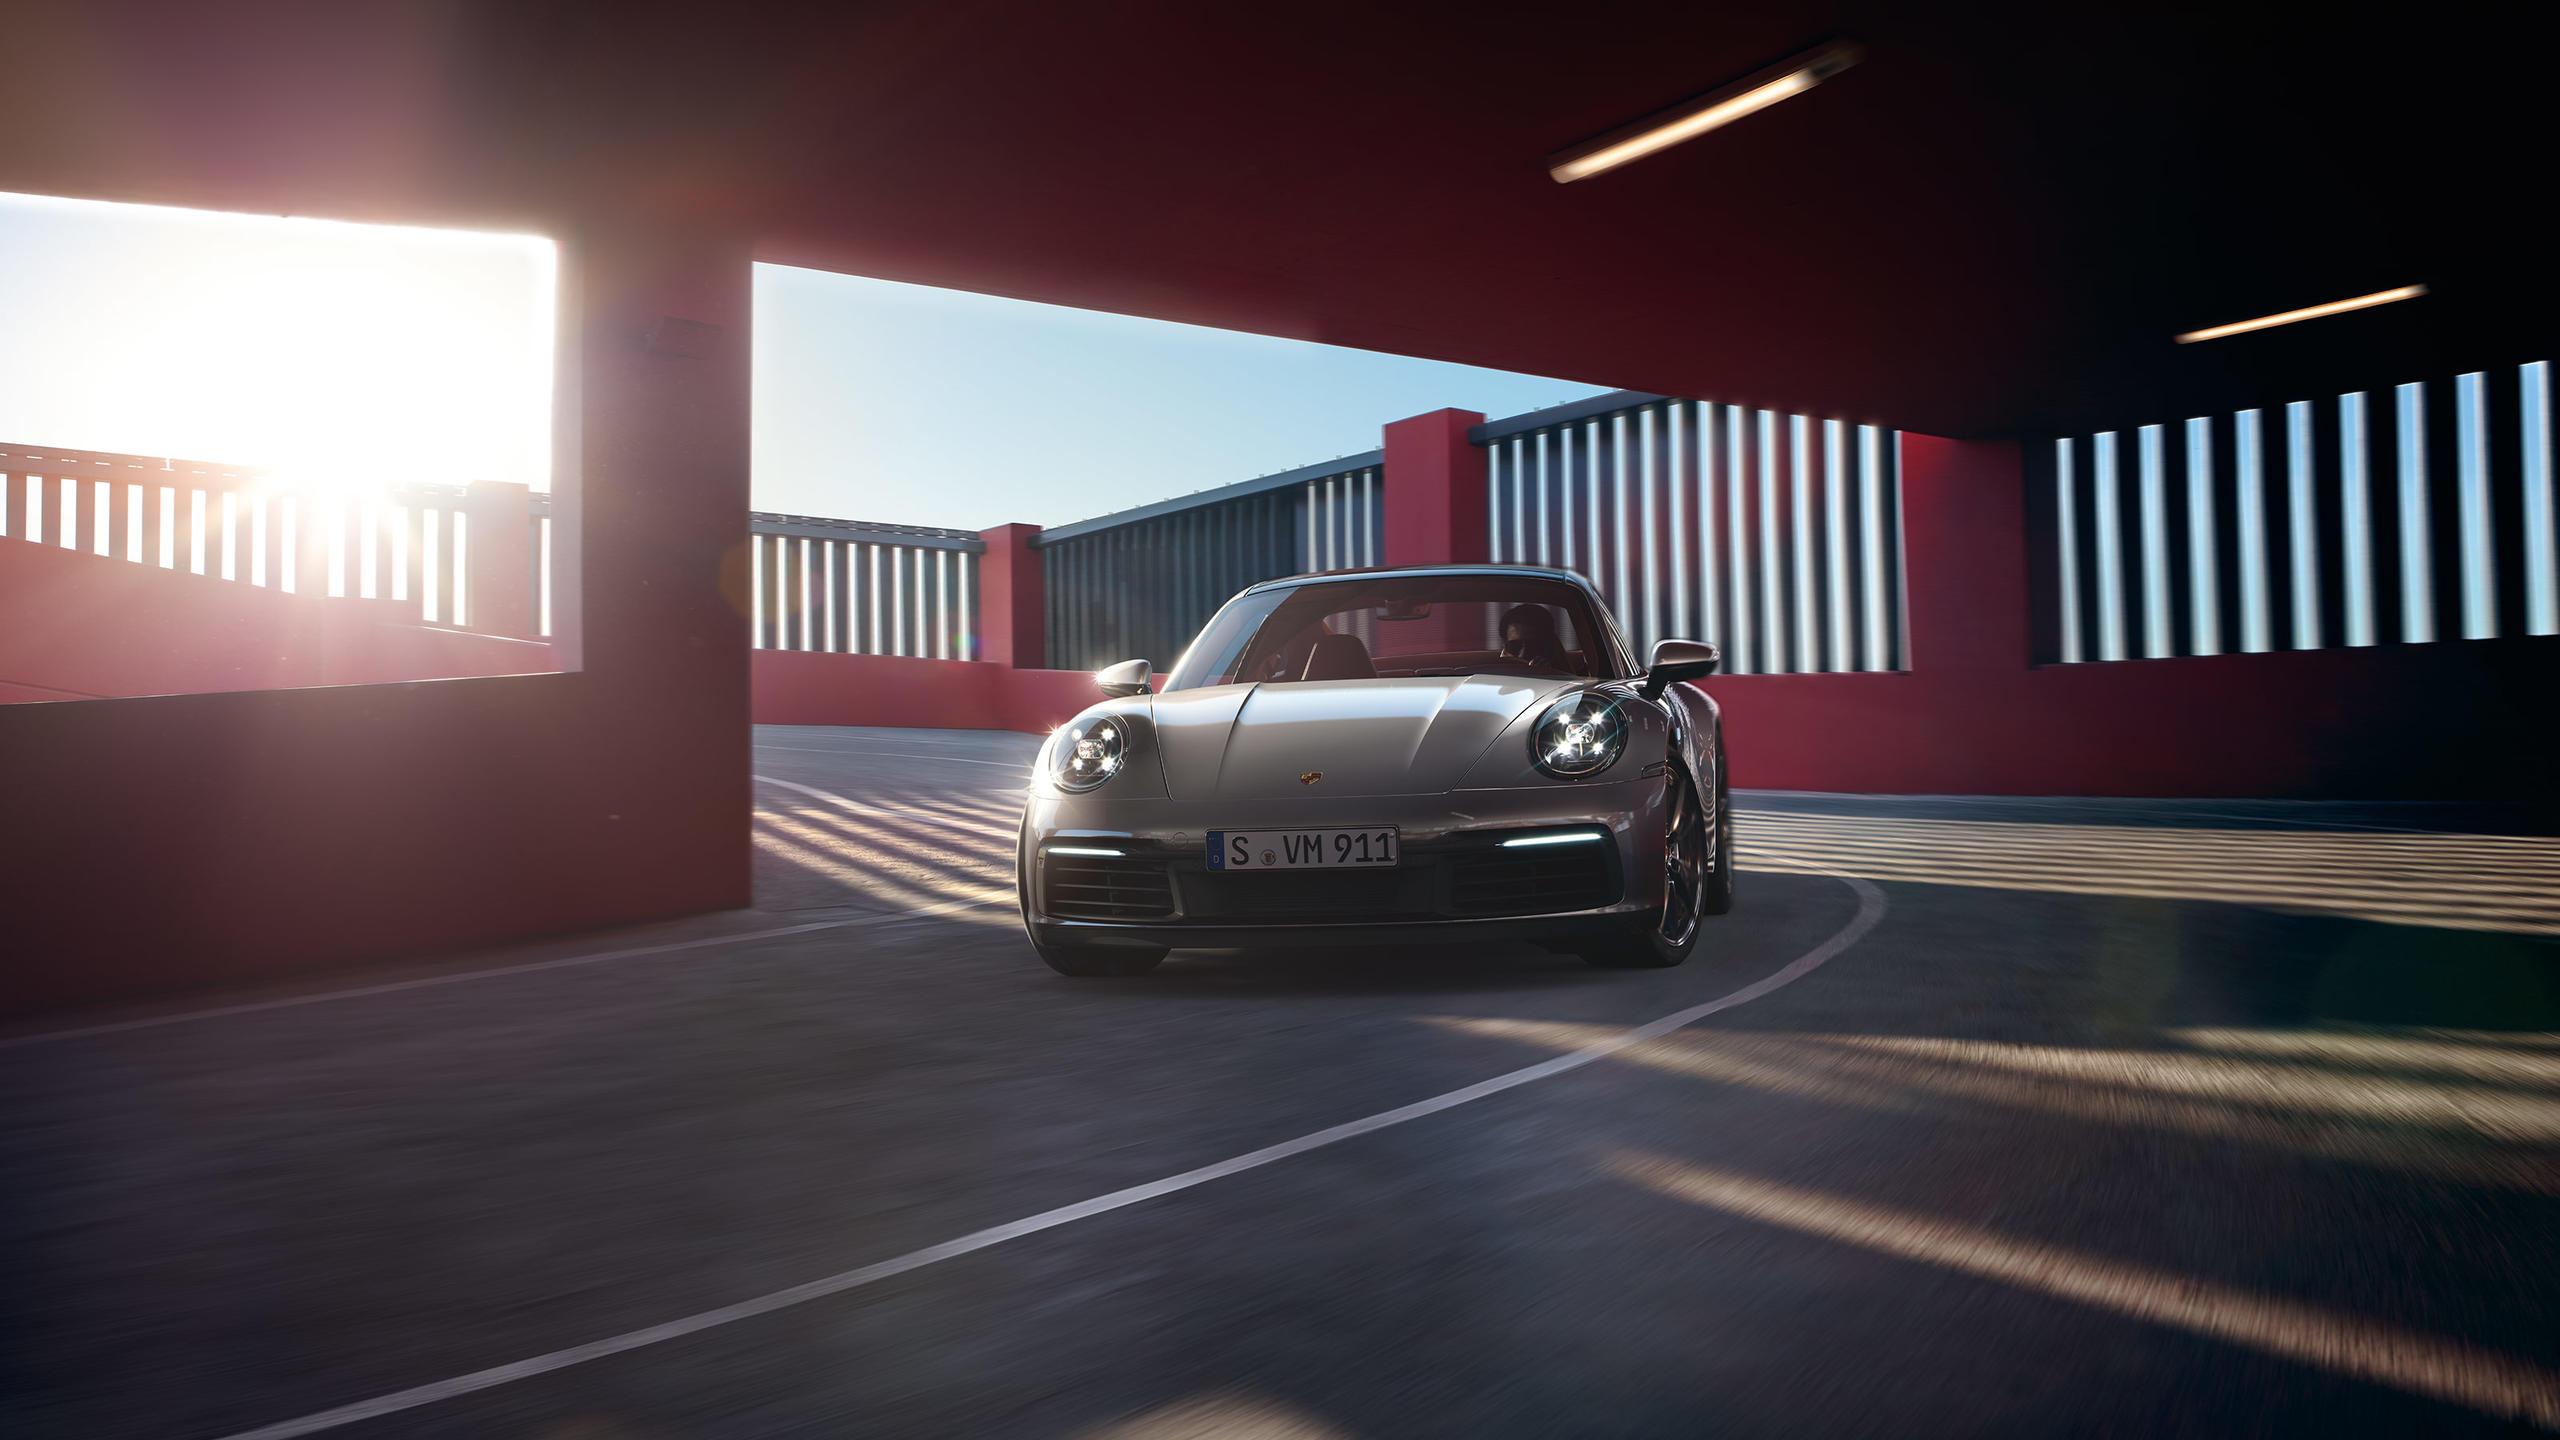 2020 Porsche 911 Carrera S Cabriolet Porsche Qubec 2560x1440